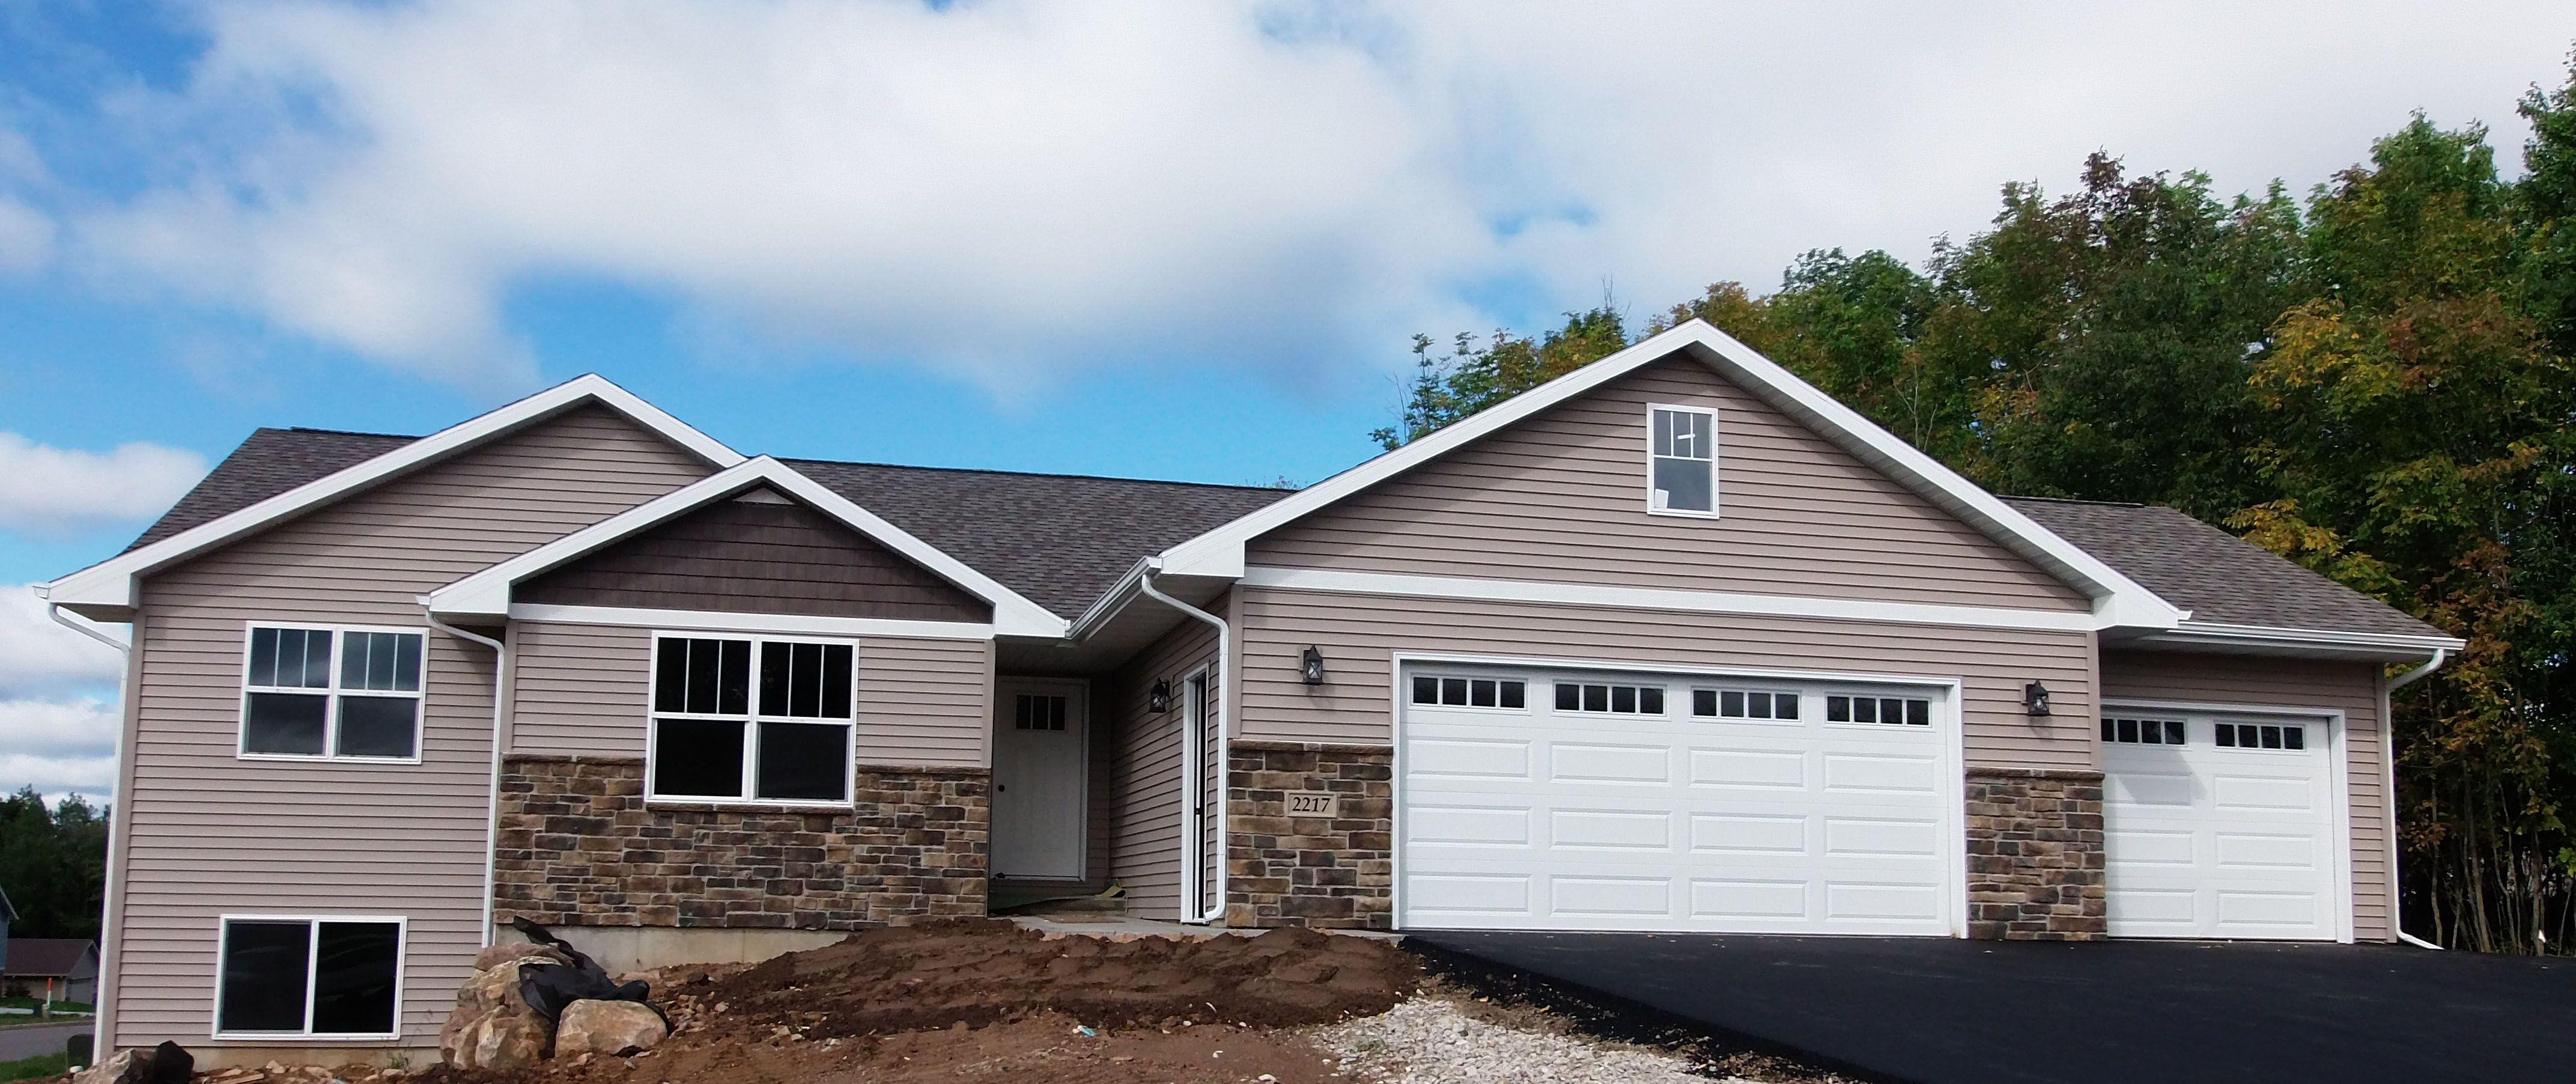 Vc105 Iris Floor Plan Ranch Siding Color Pebble Clay Harvest Cedar Shakes Stone Color Pennsylvania Ledges Floor Plans Ranch House Styles House Design